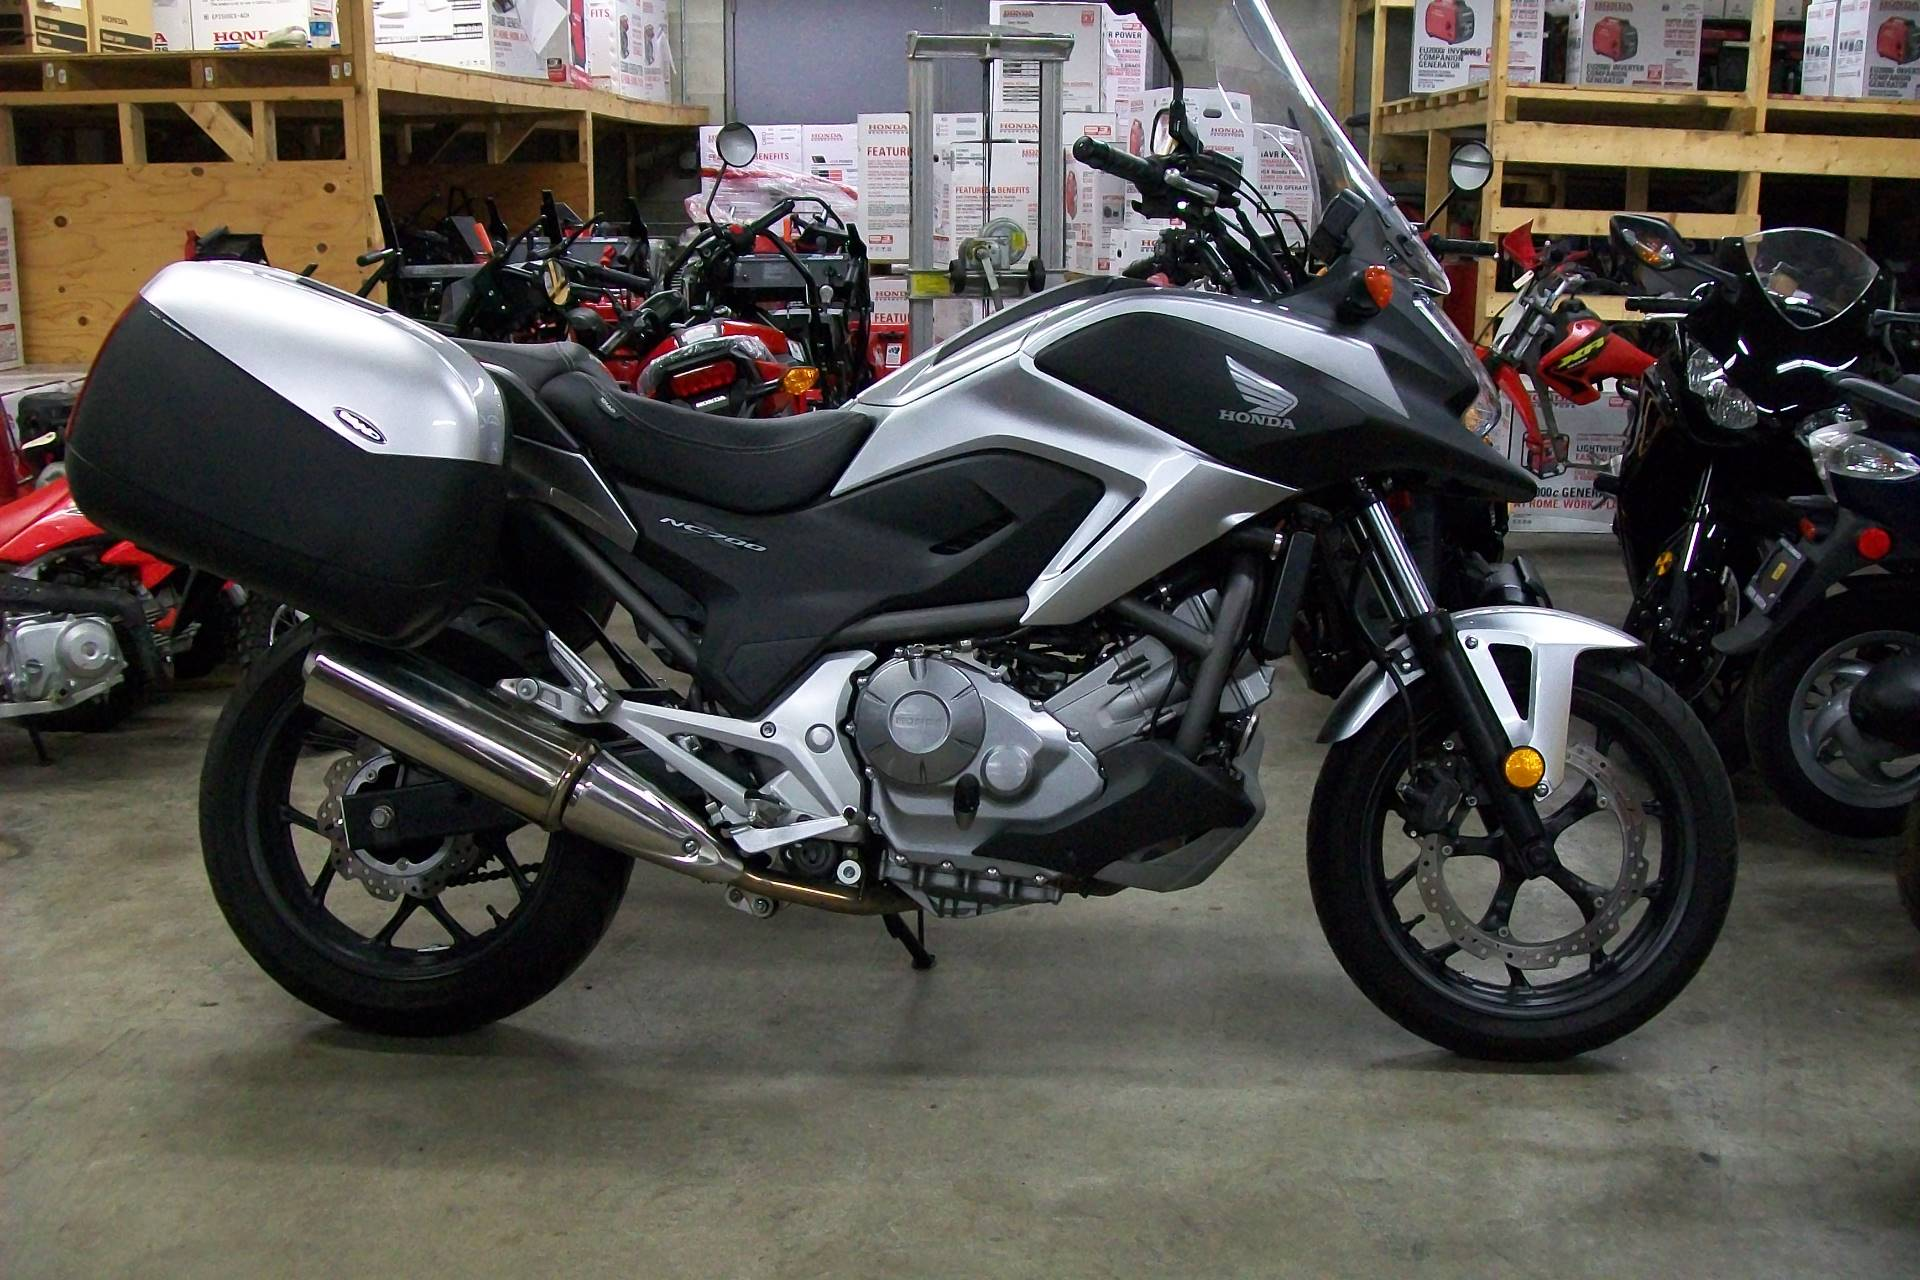 2012 honda nc700x for sale for Honda weymouth ma